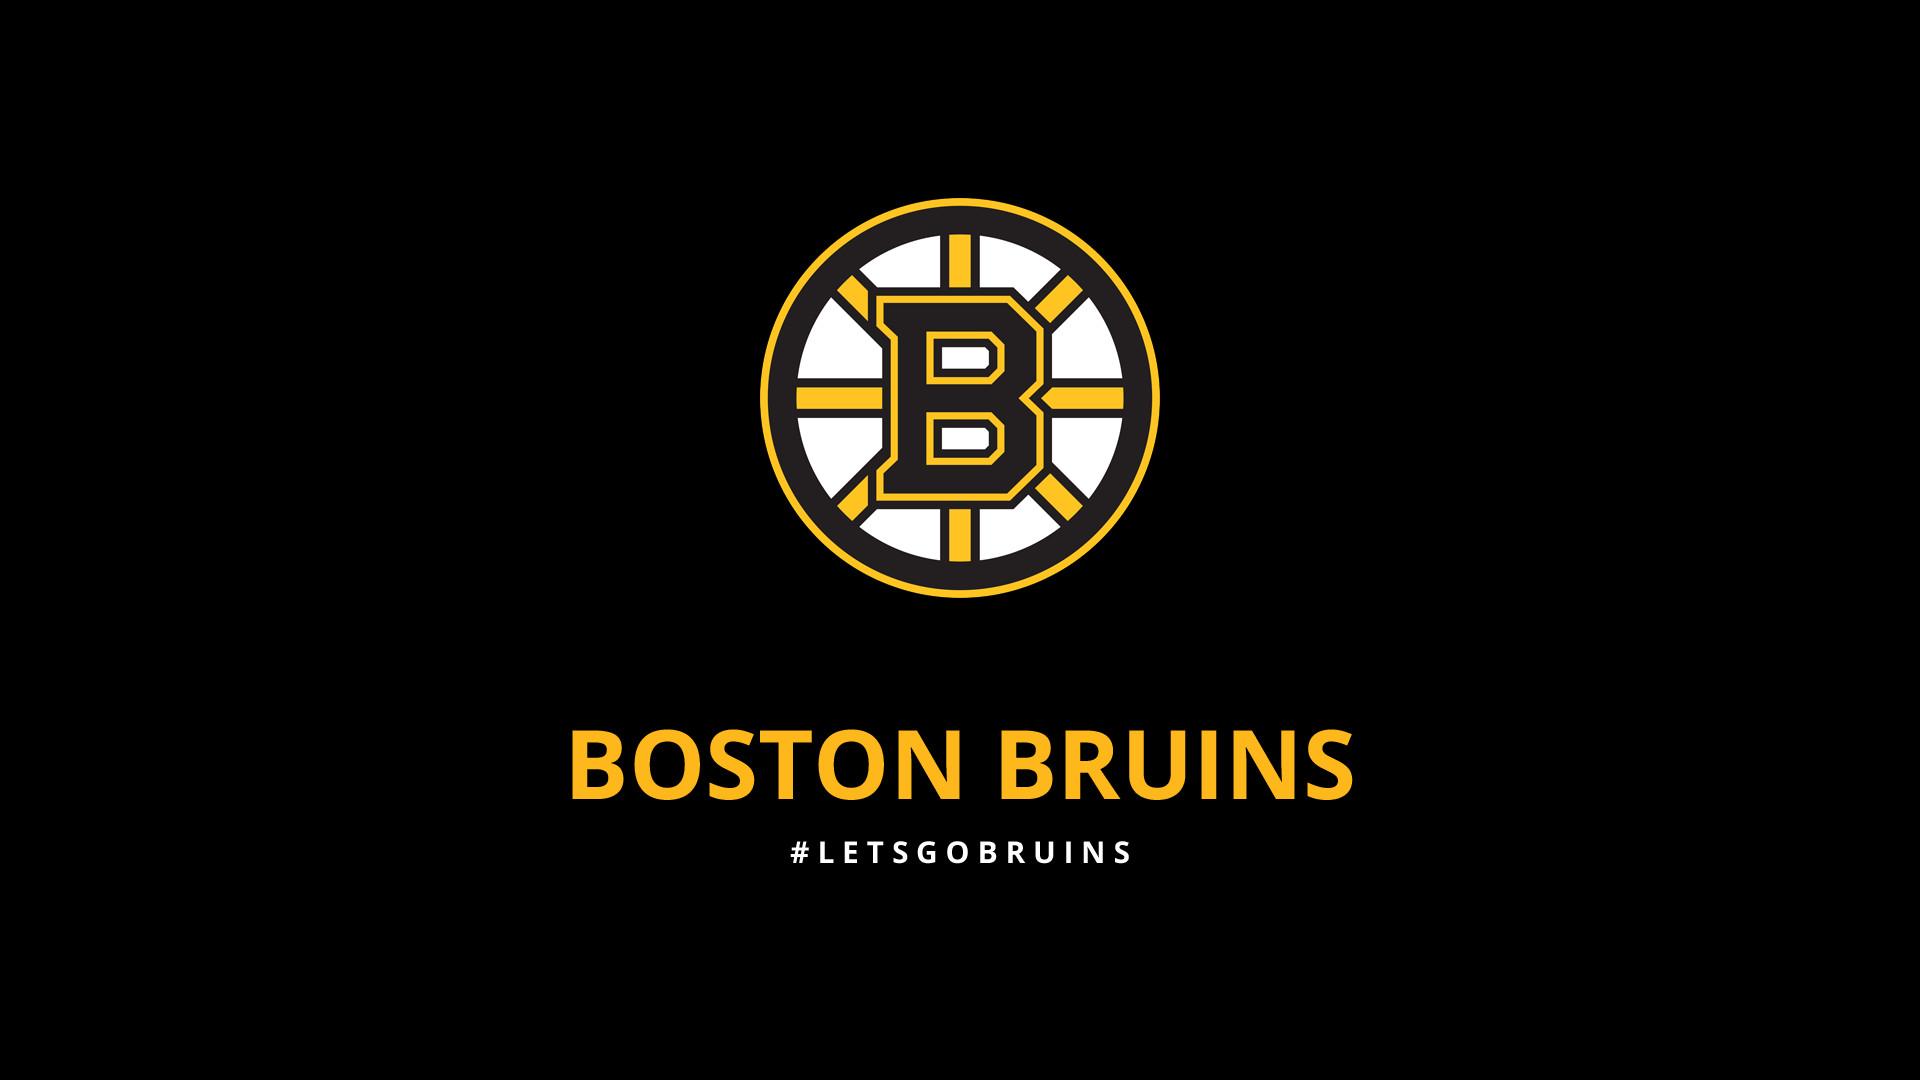 Res: 1920x1080, Boston Bruins Wallpapers Wallpaper